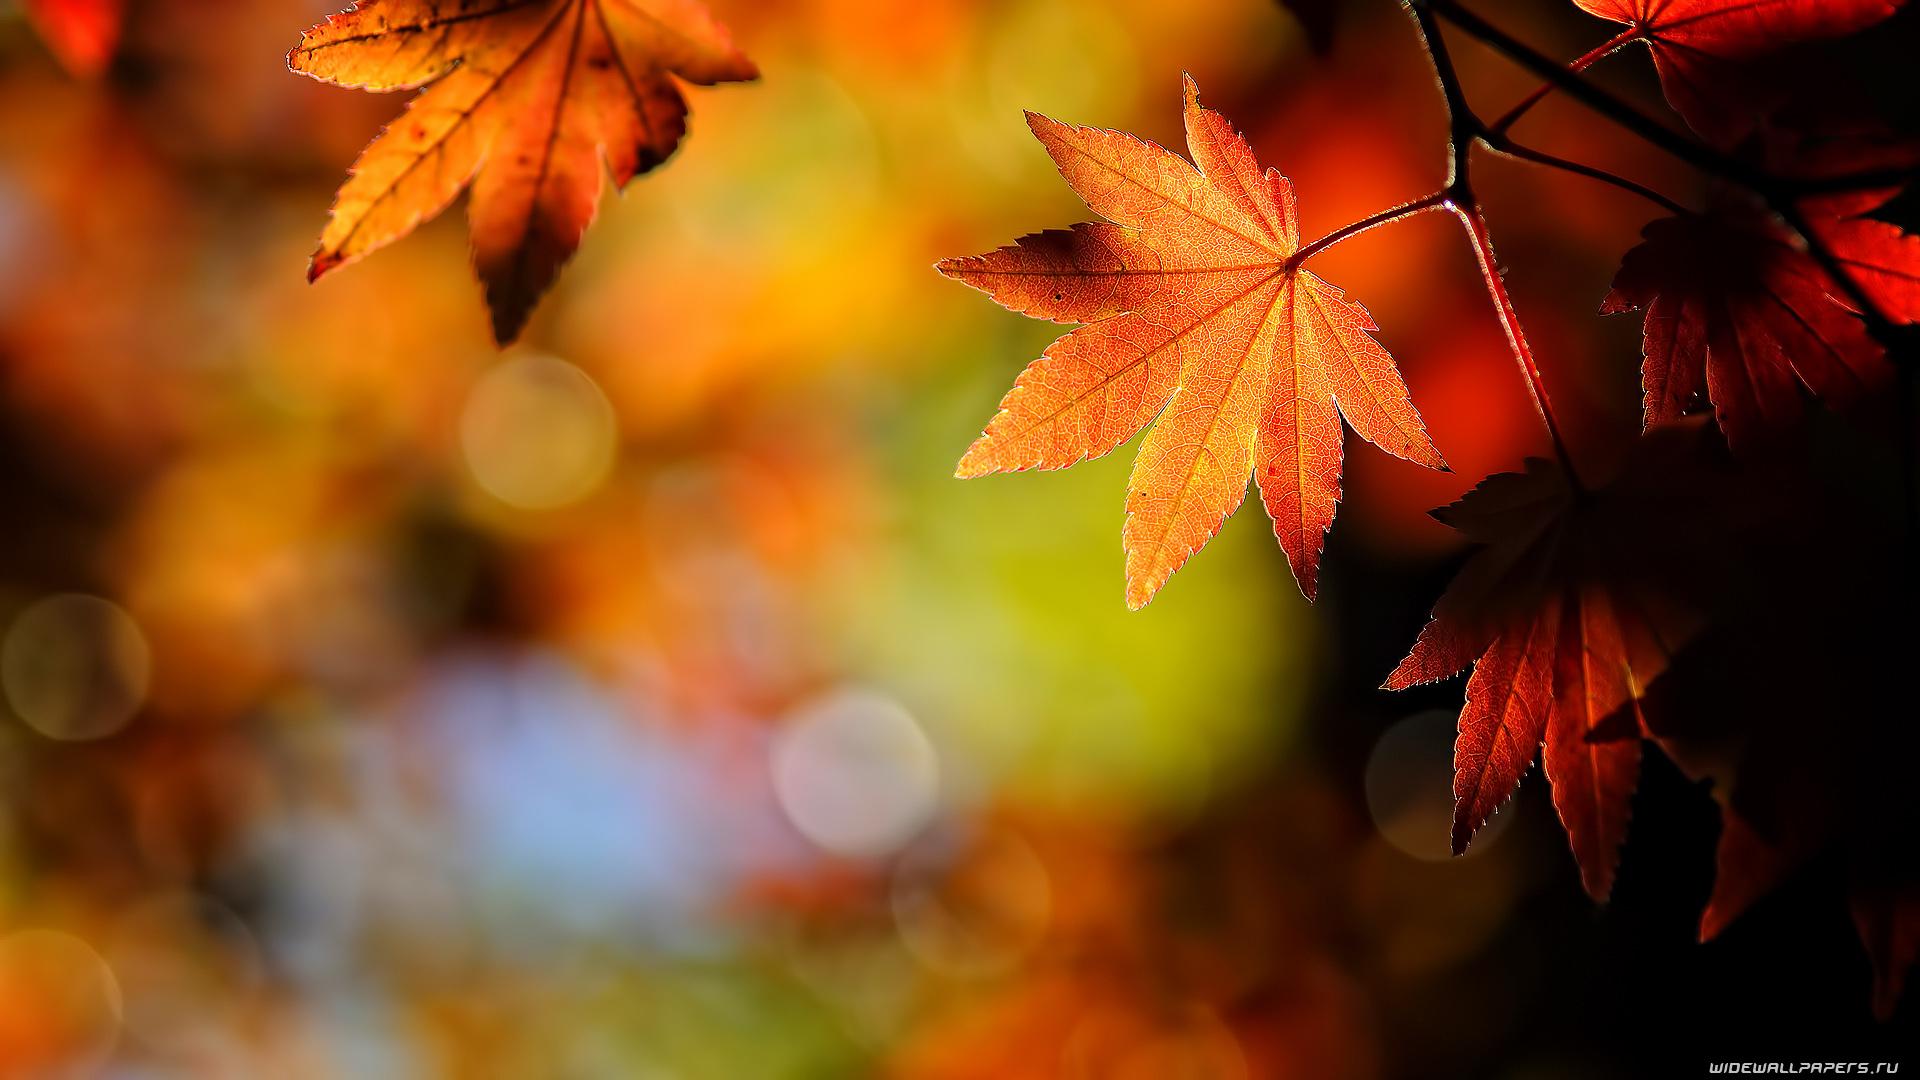 Autumn-Leaves-Hd-wallpaper-wp6002149